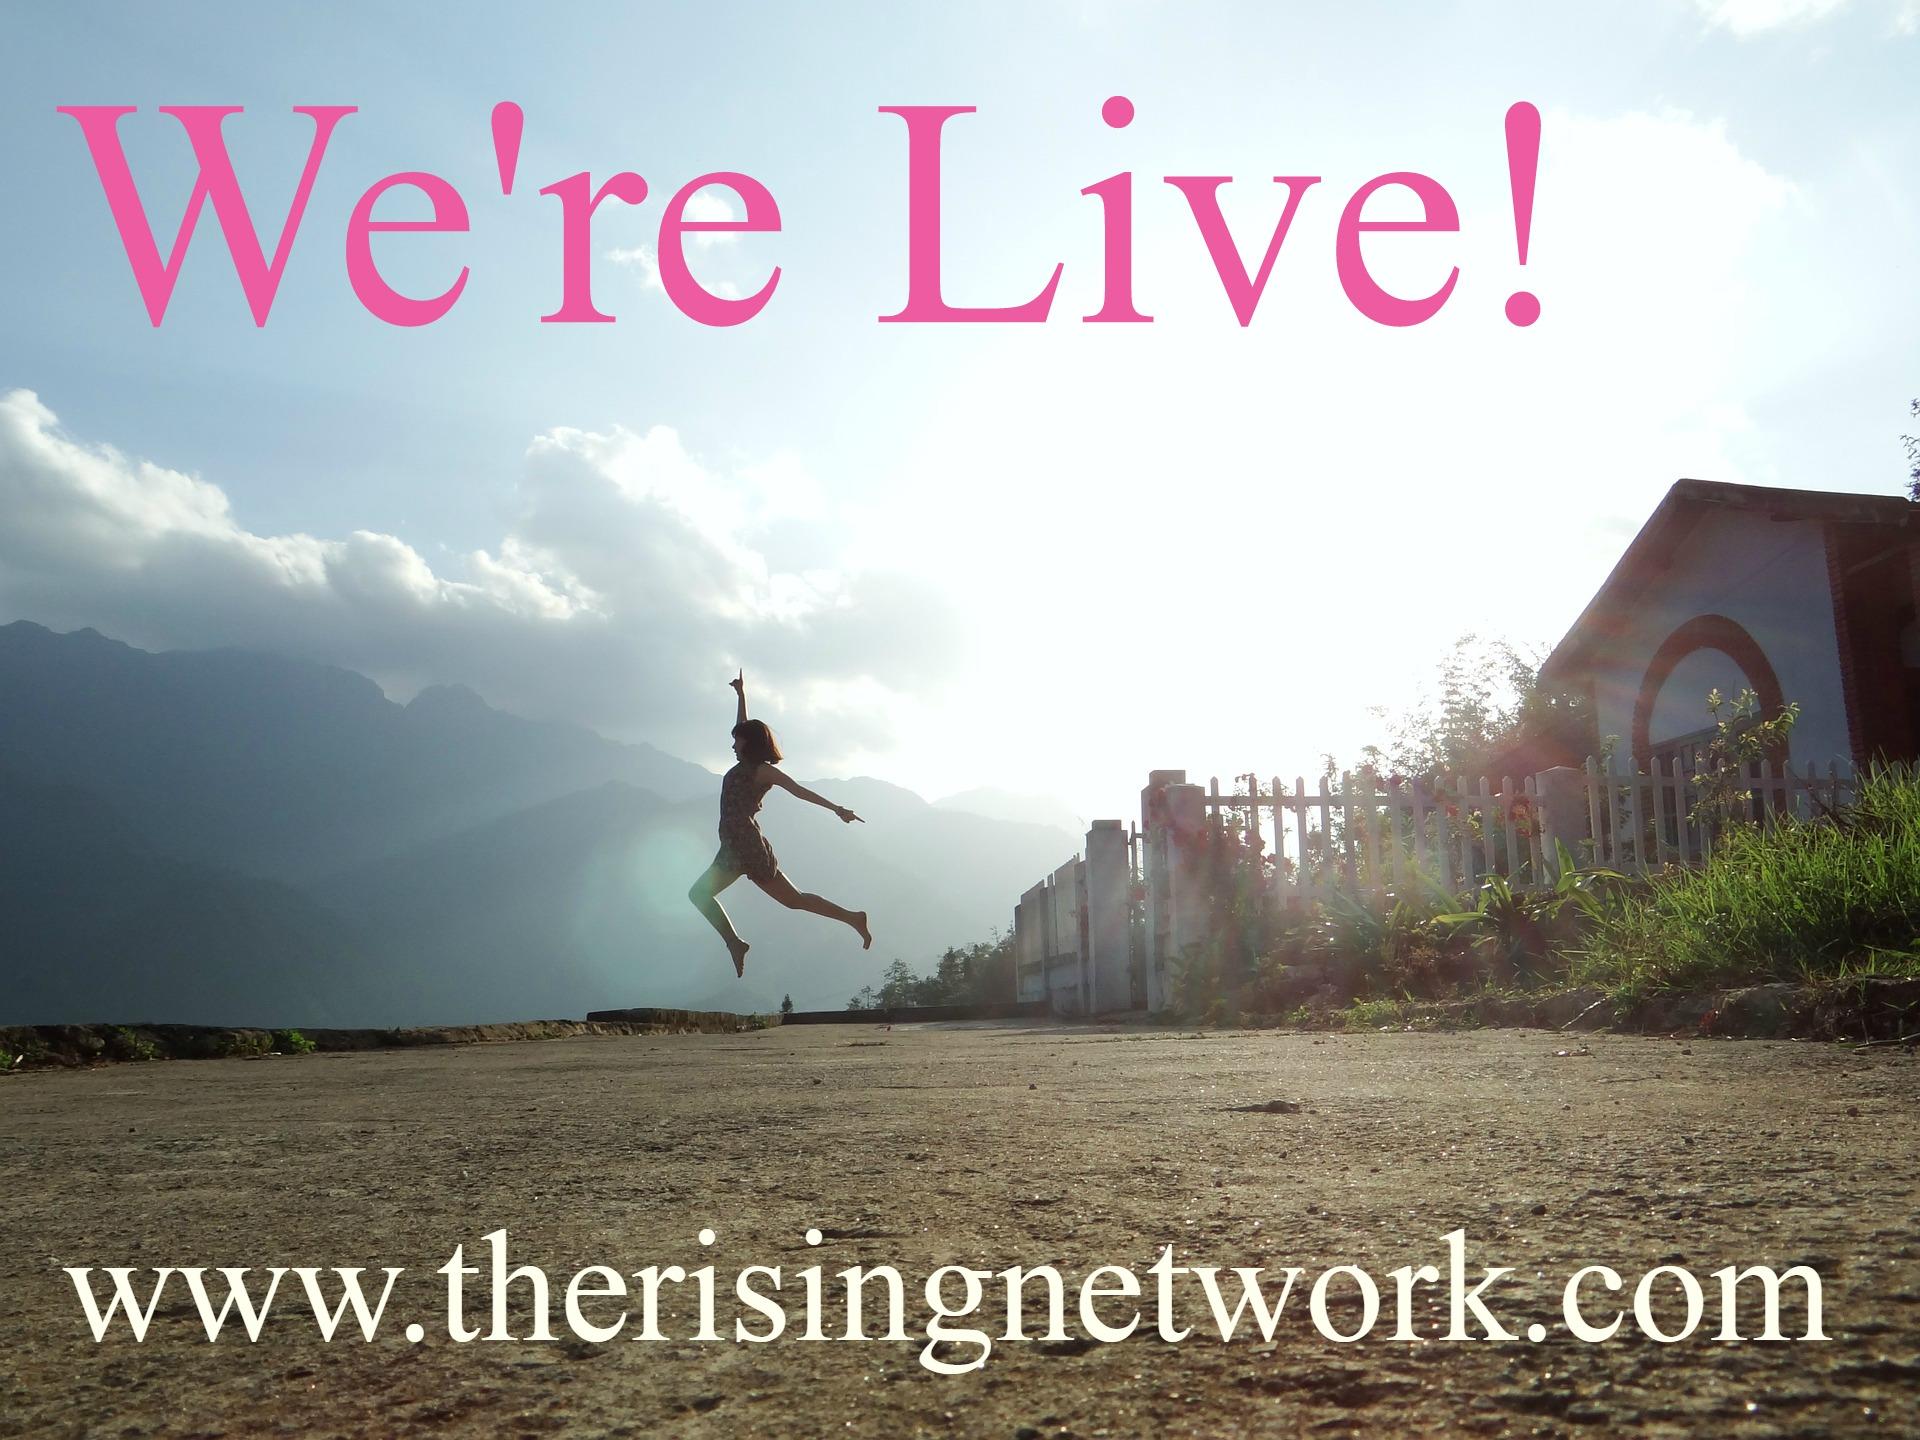 We're Live!